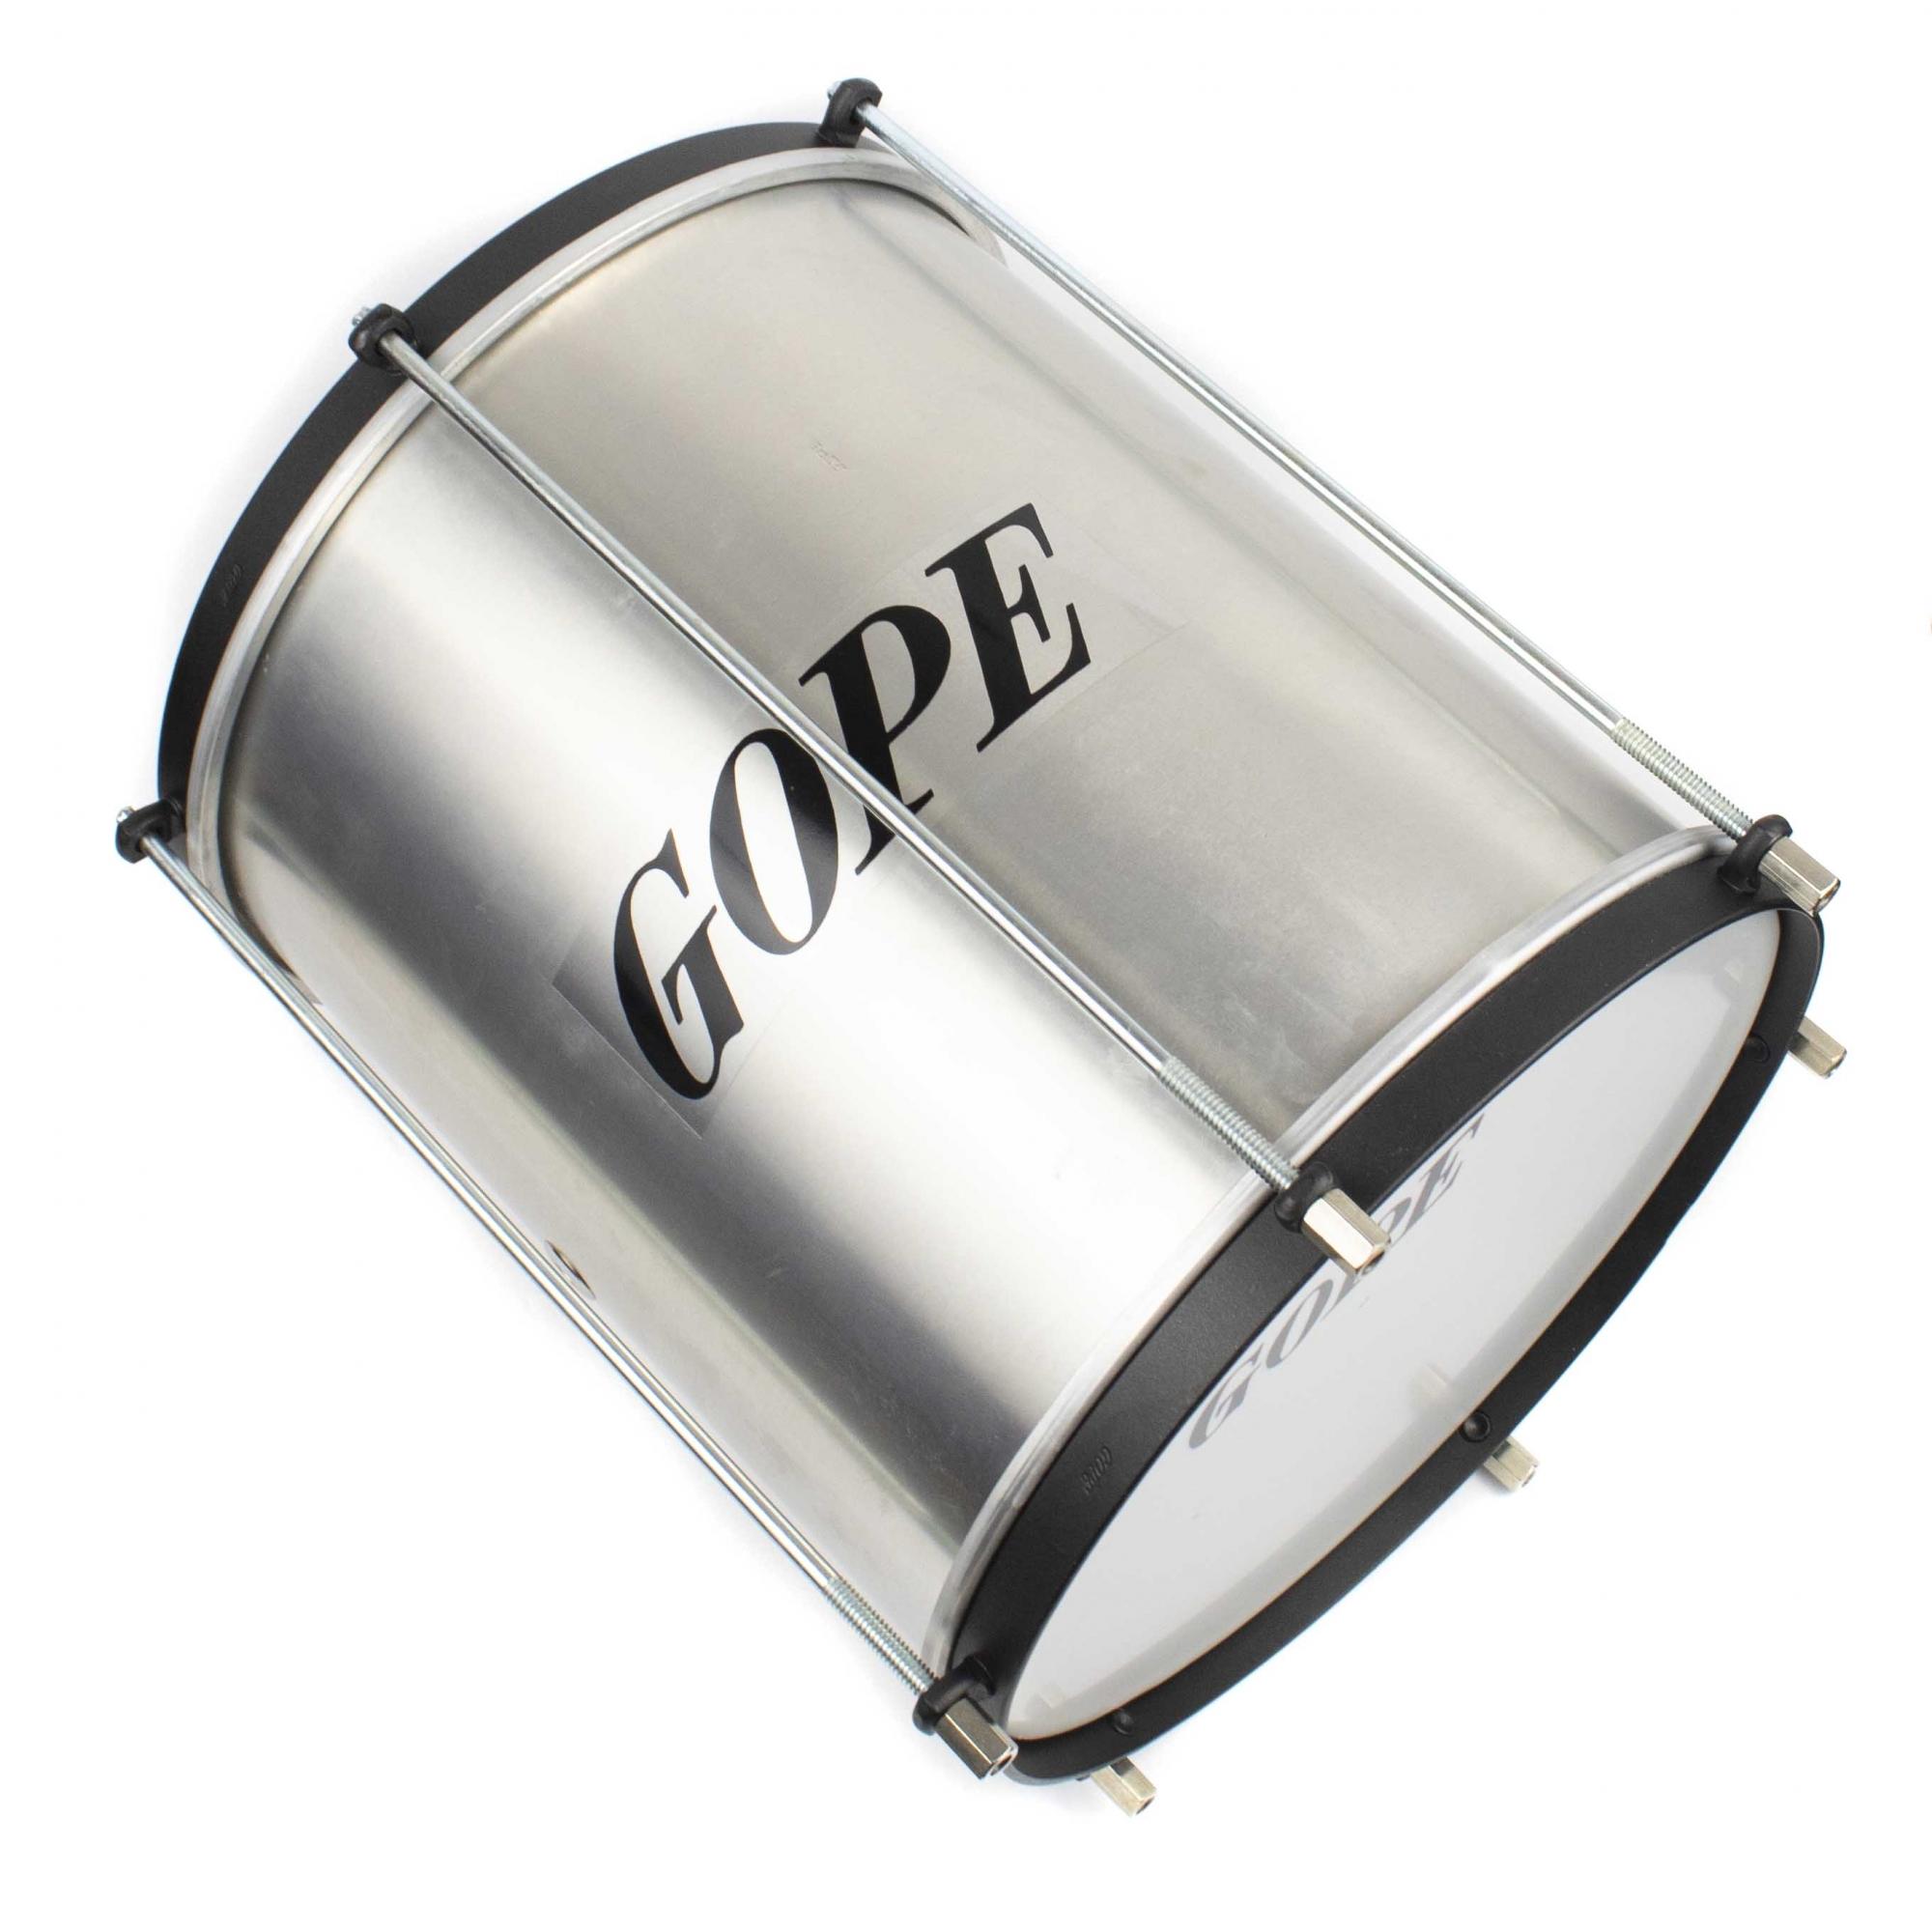 Repinique Bacurinha Gope 8 pol 30 cm Aluminio